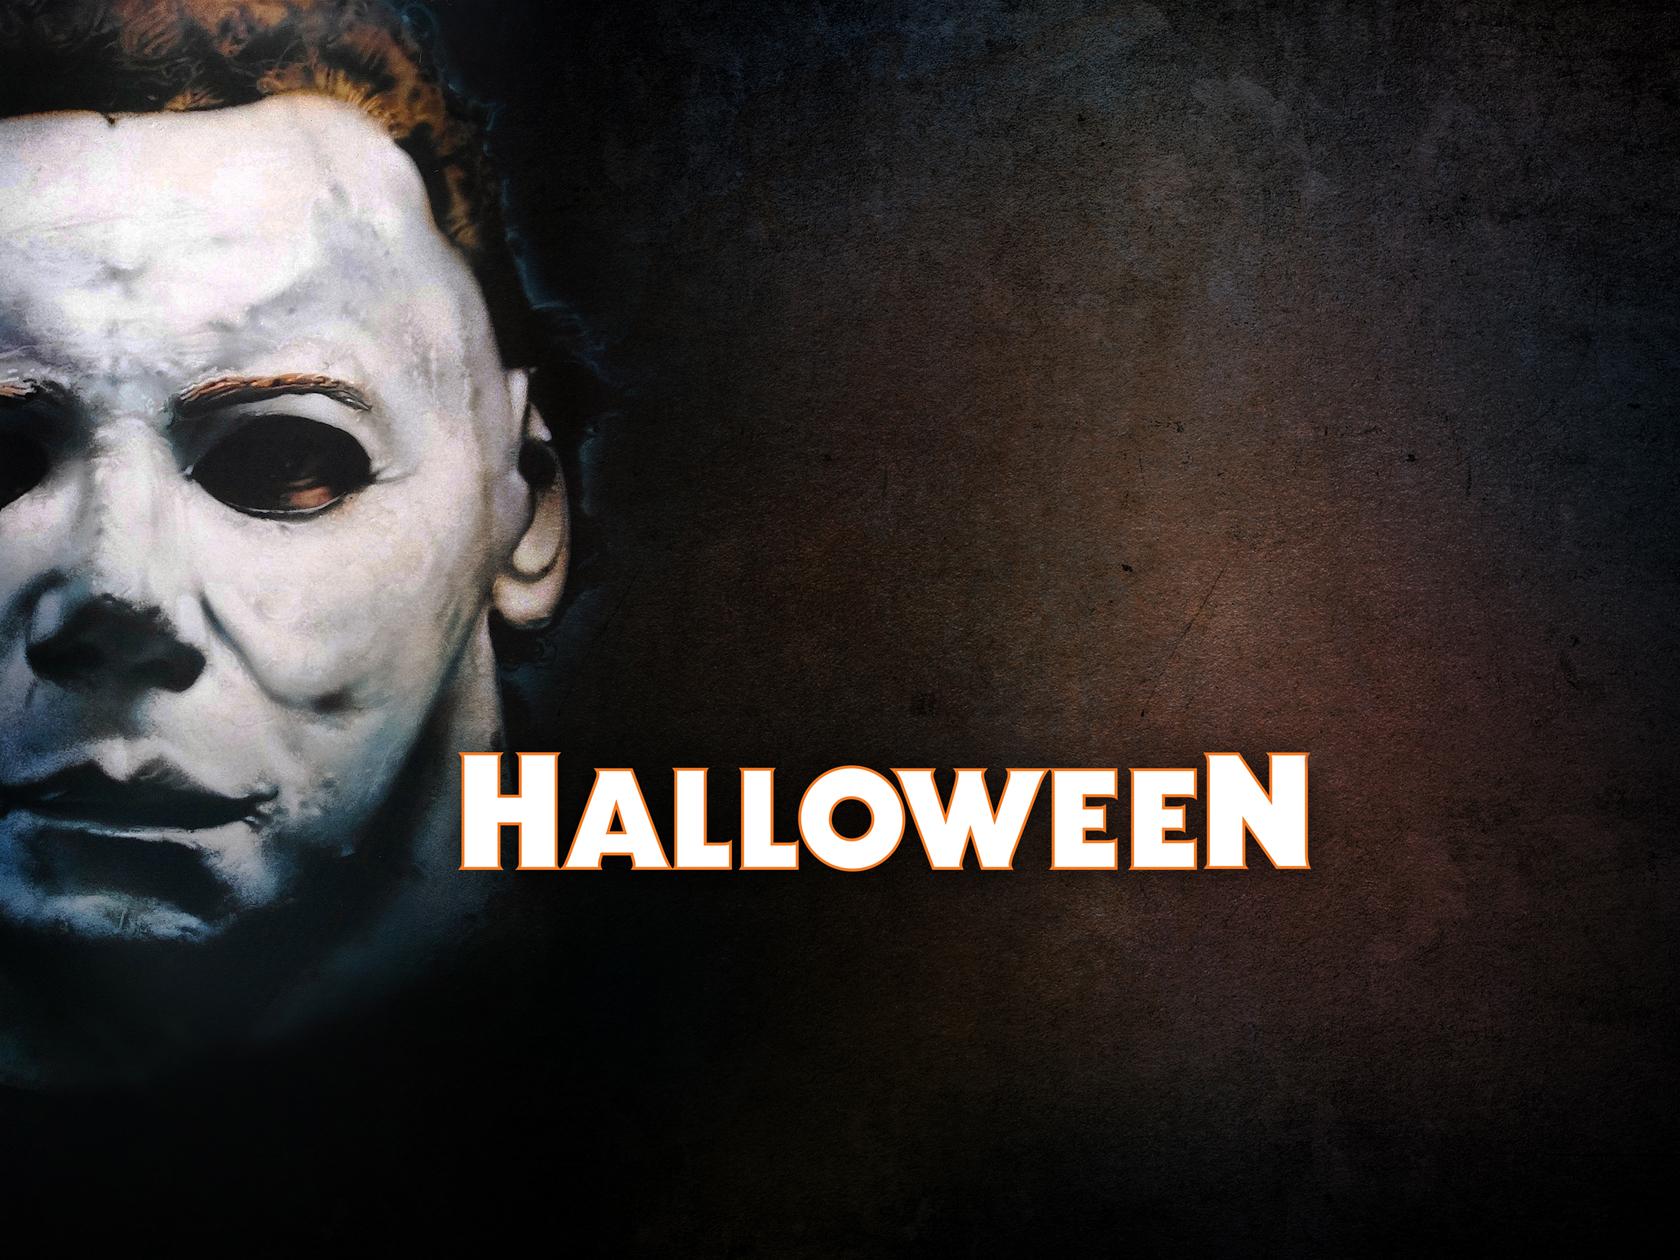 Halloween_michael_myers_sticker.jpg